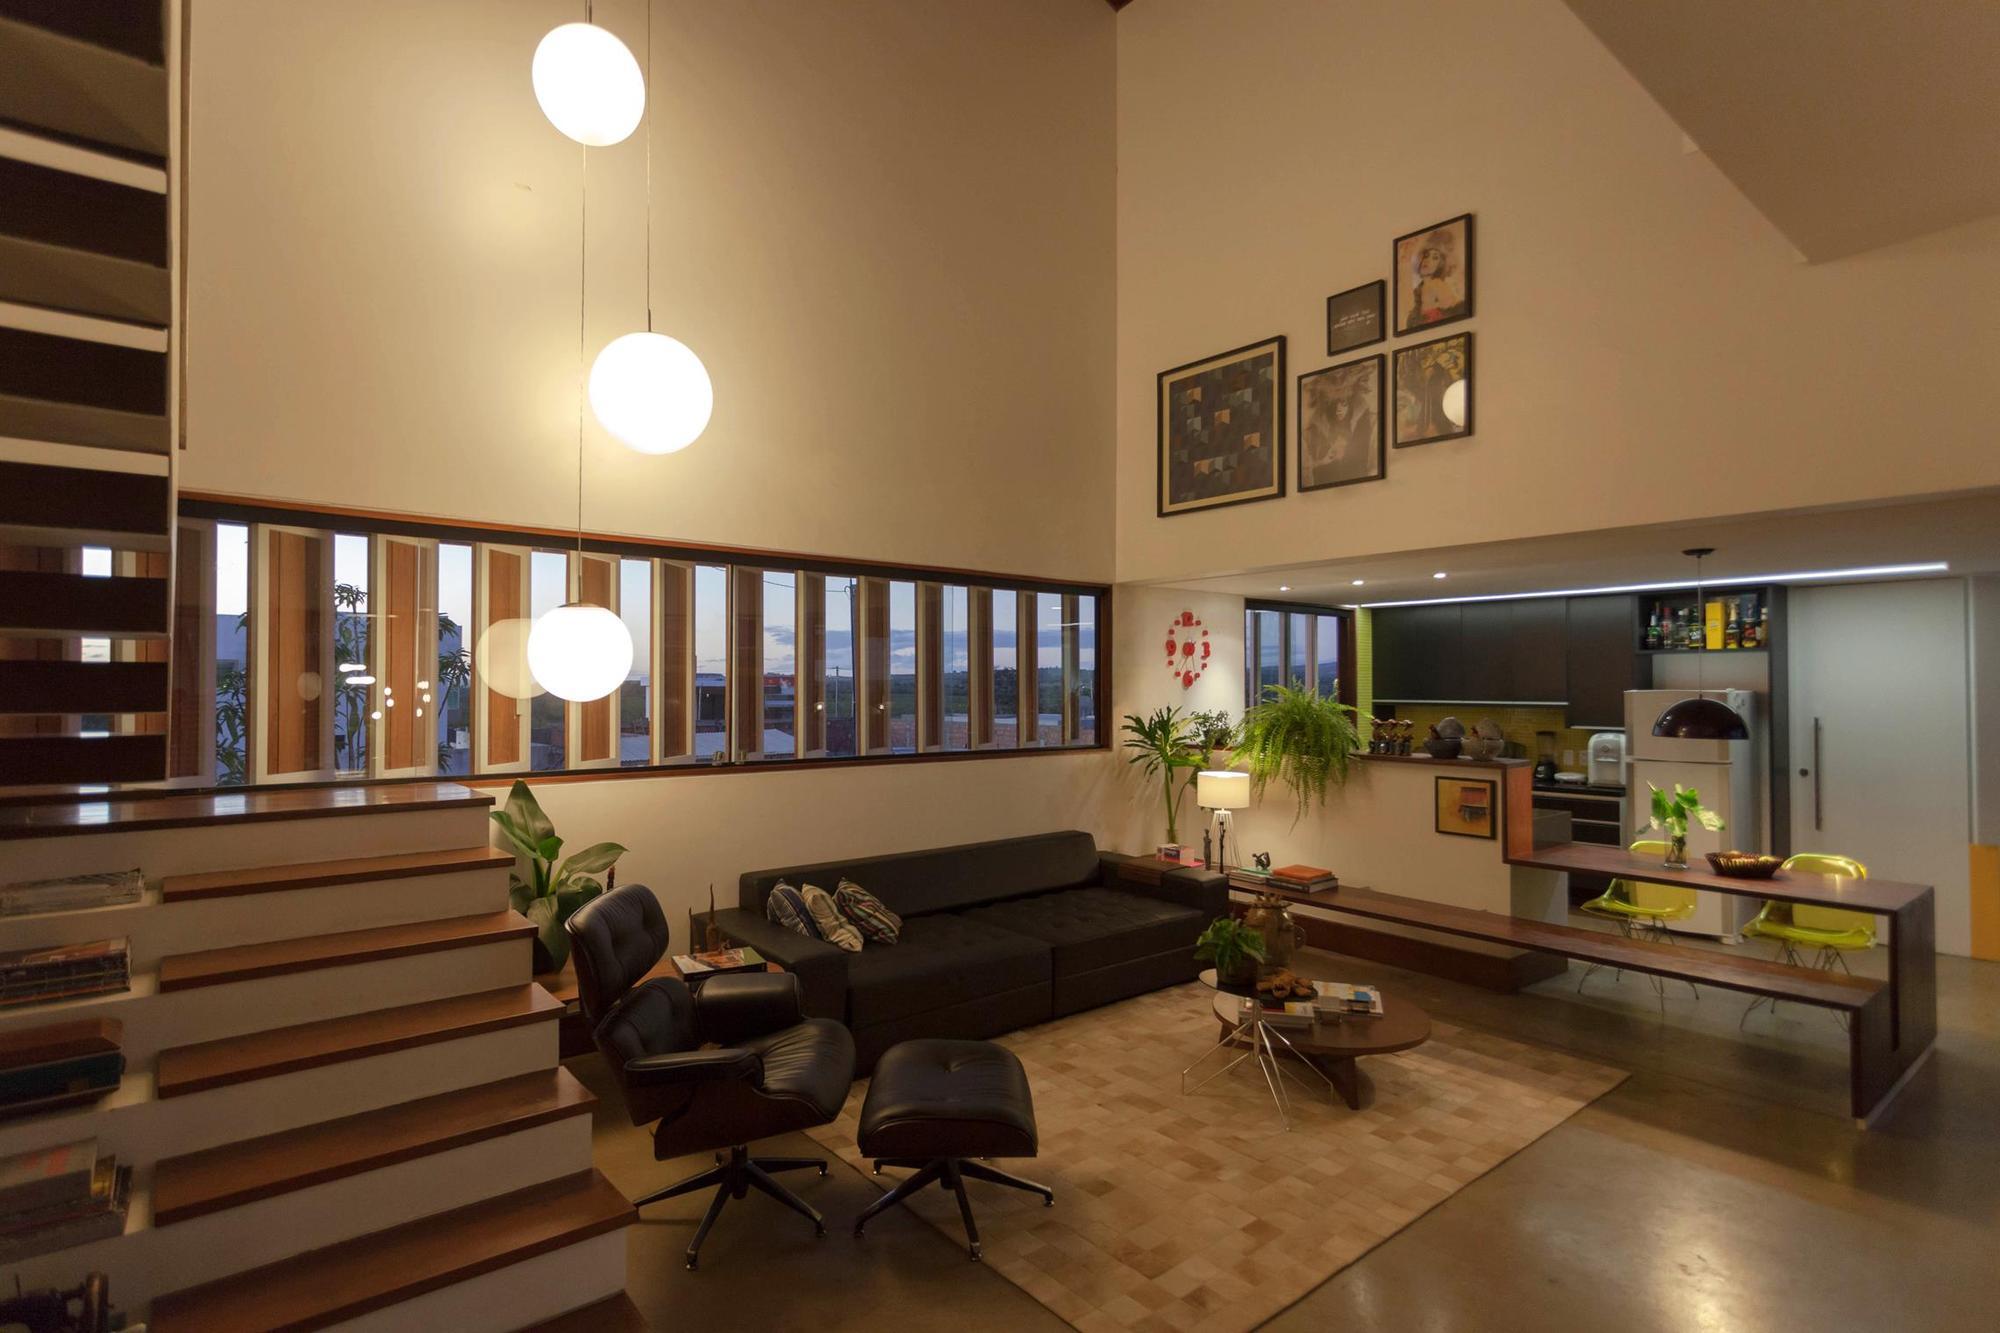 54484770e58ece999700018e_architect-s-house-jirau-arquitetura__mg_9128